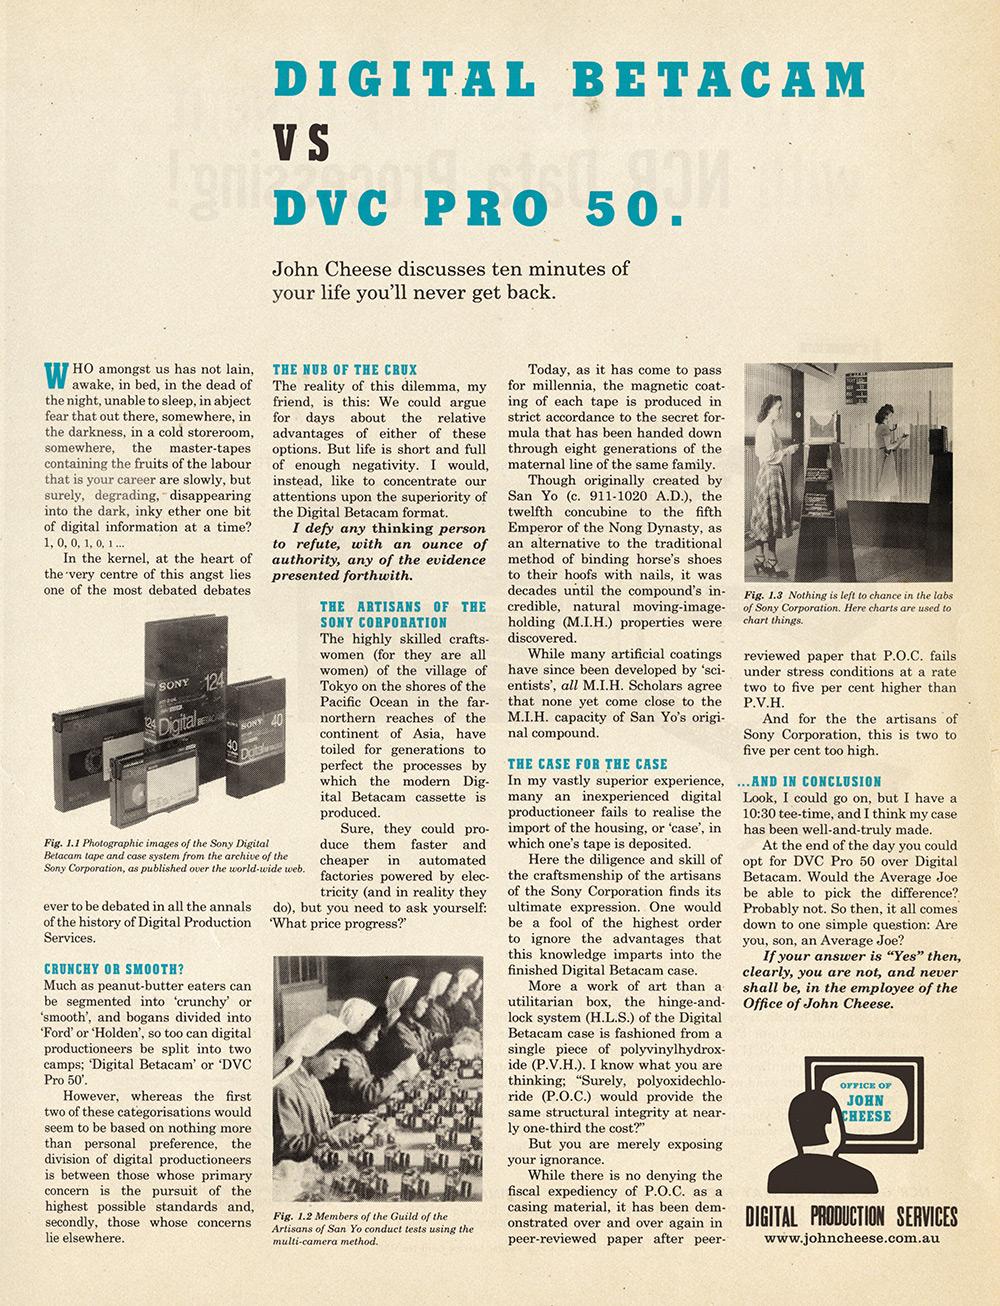 Digital Betacam vs DVC Pro 50